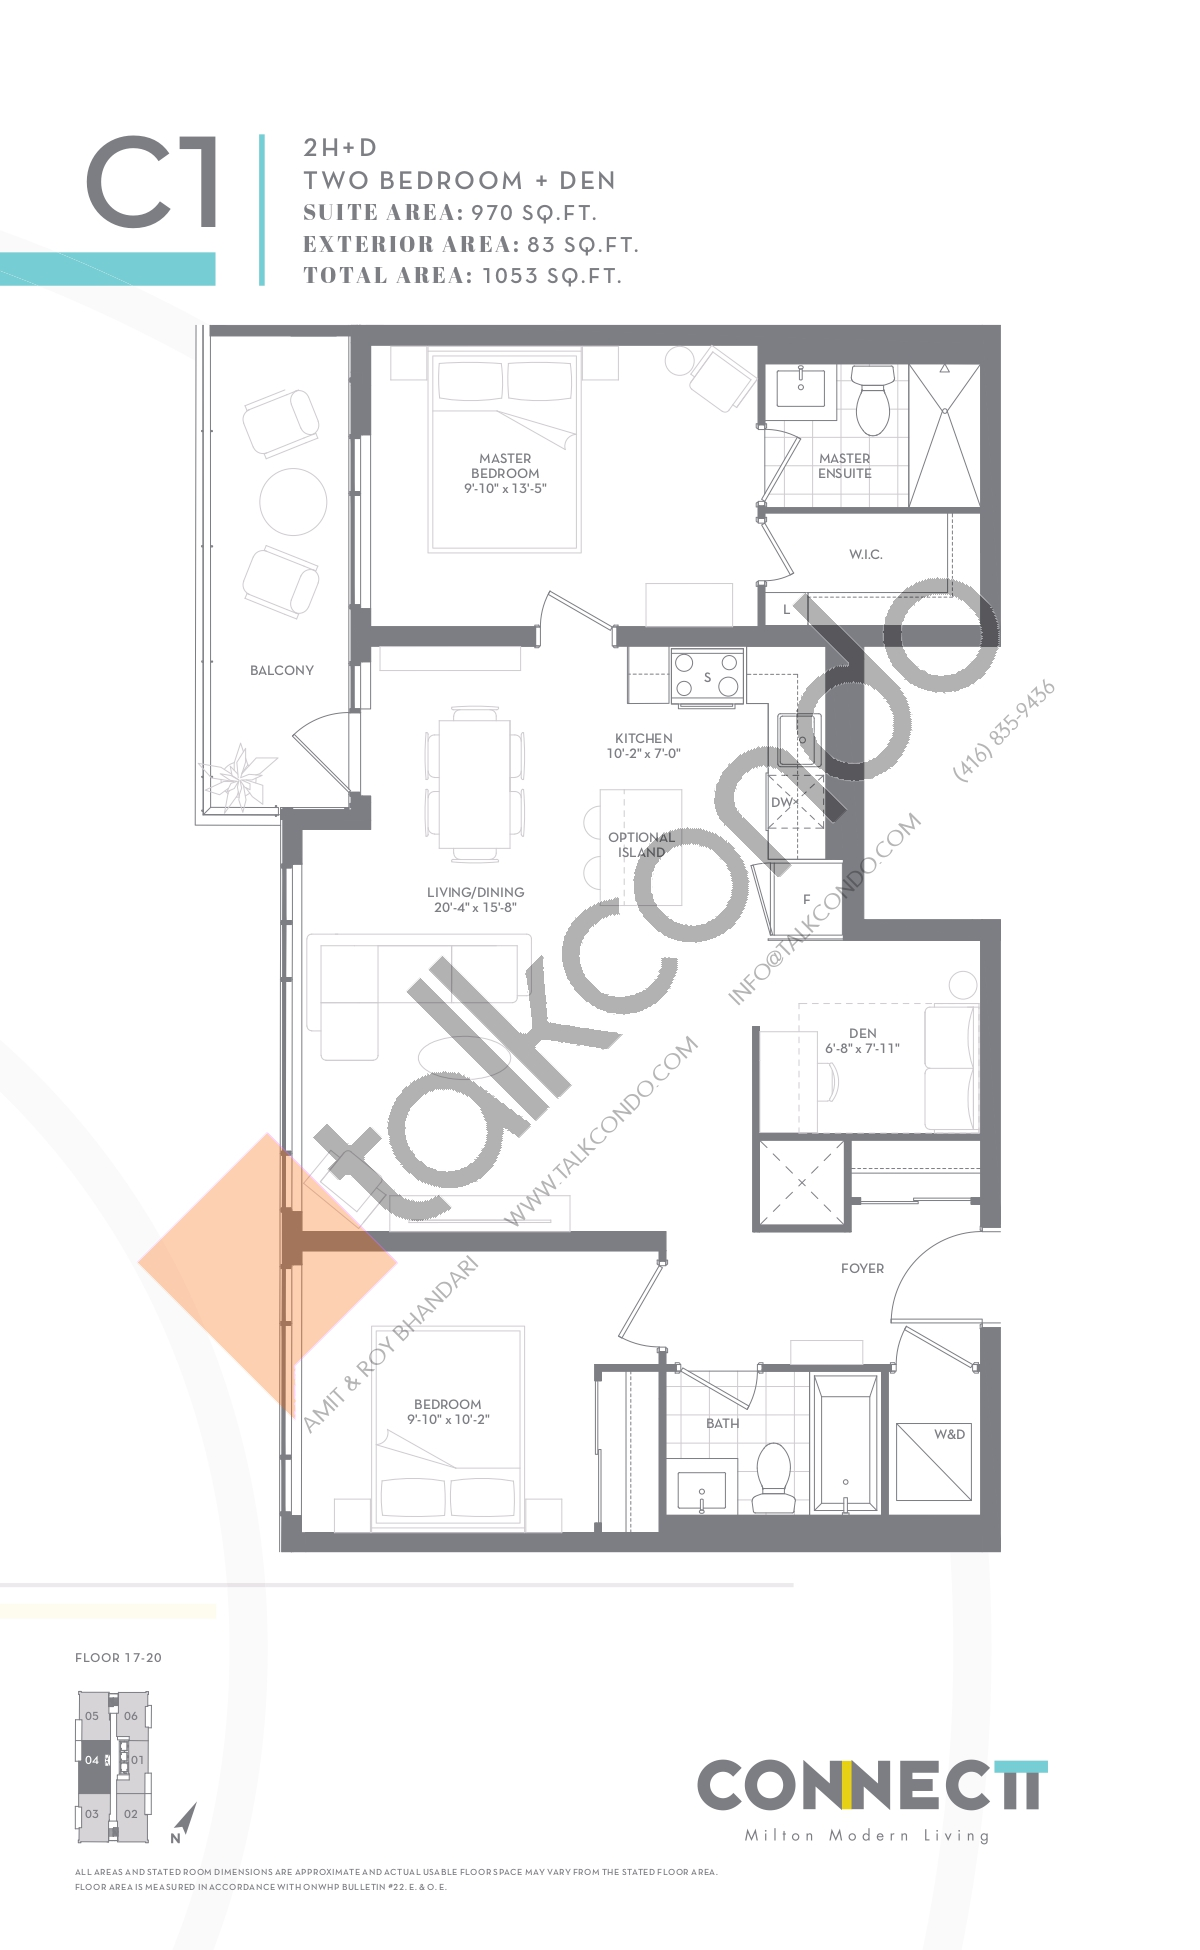 2H+D Floor Plan at Connectt Urban Community Condos - 970 sq.ft